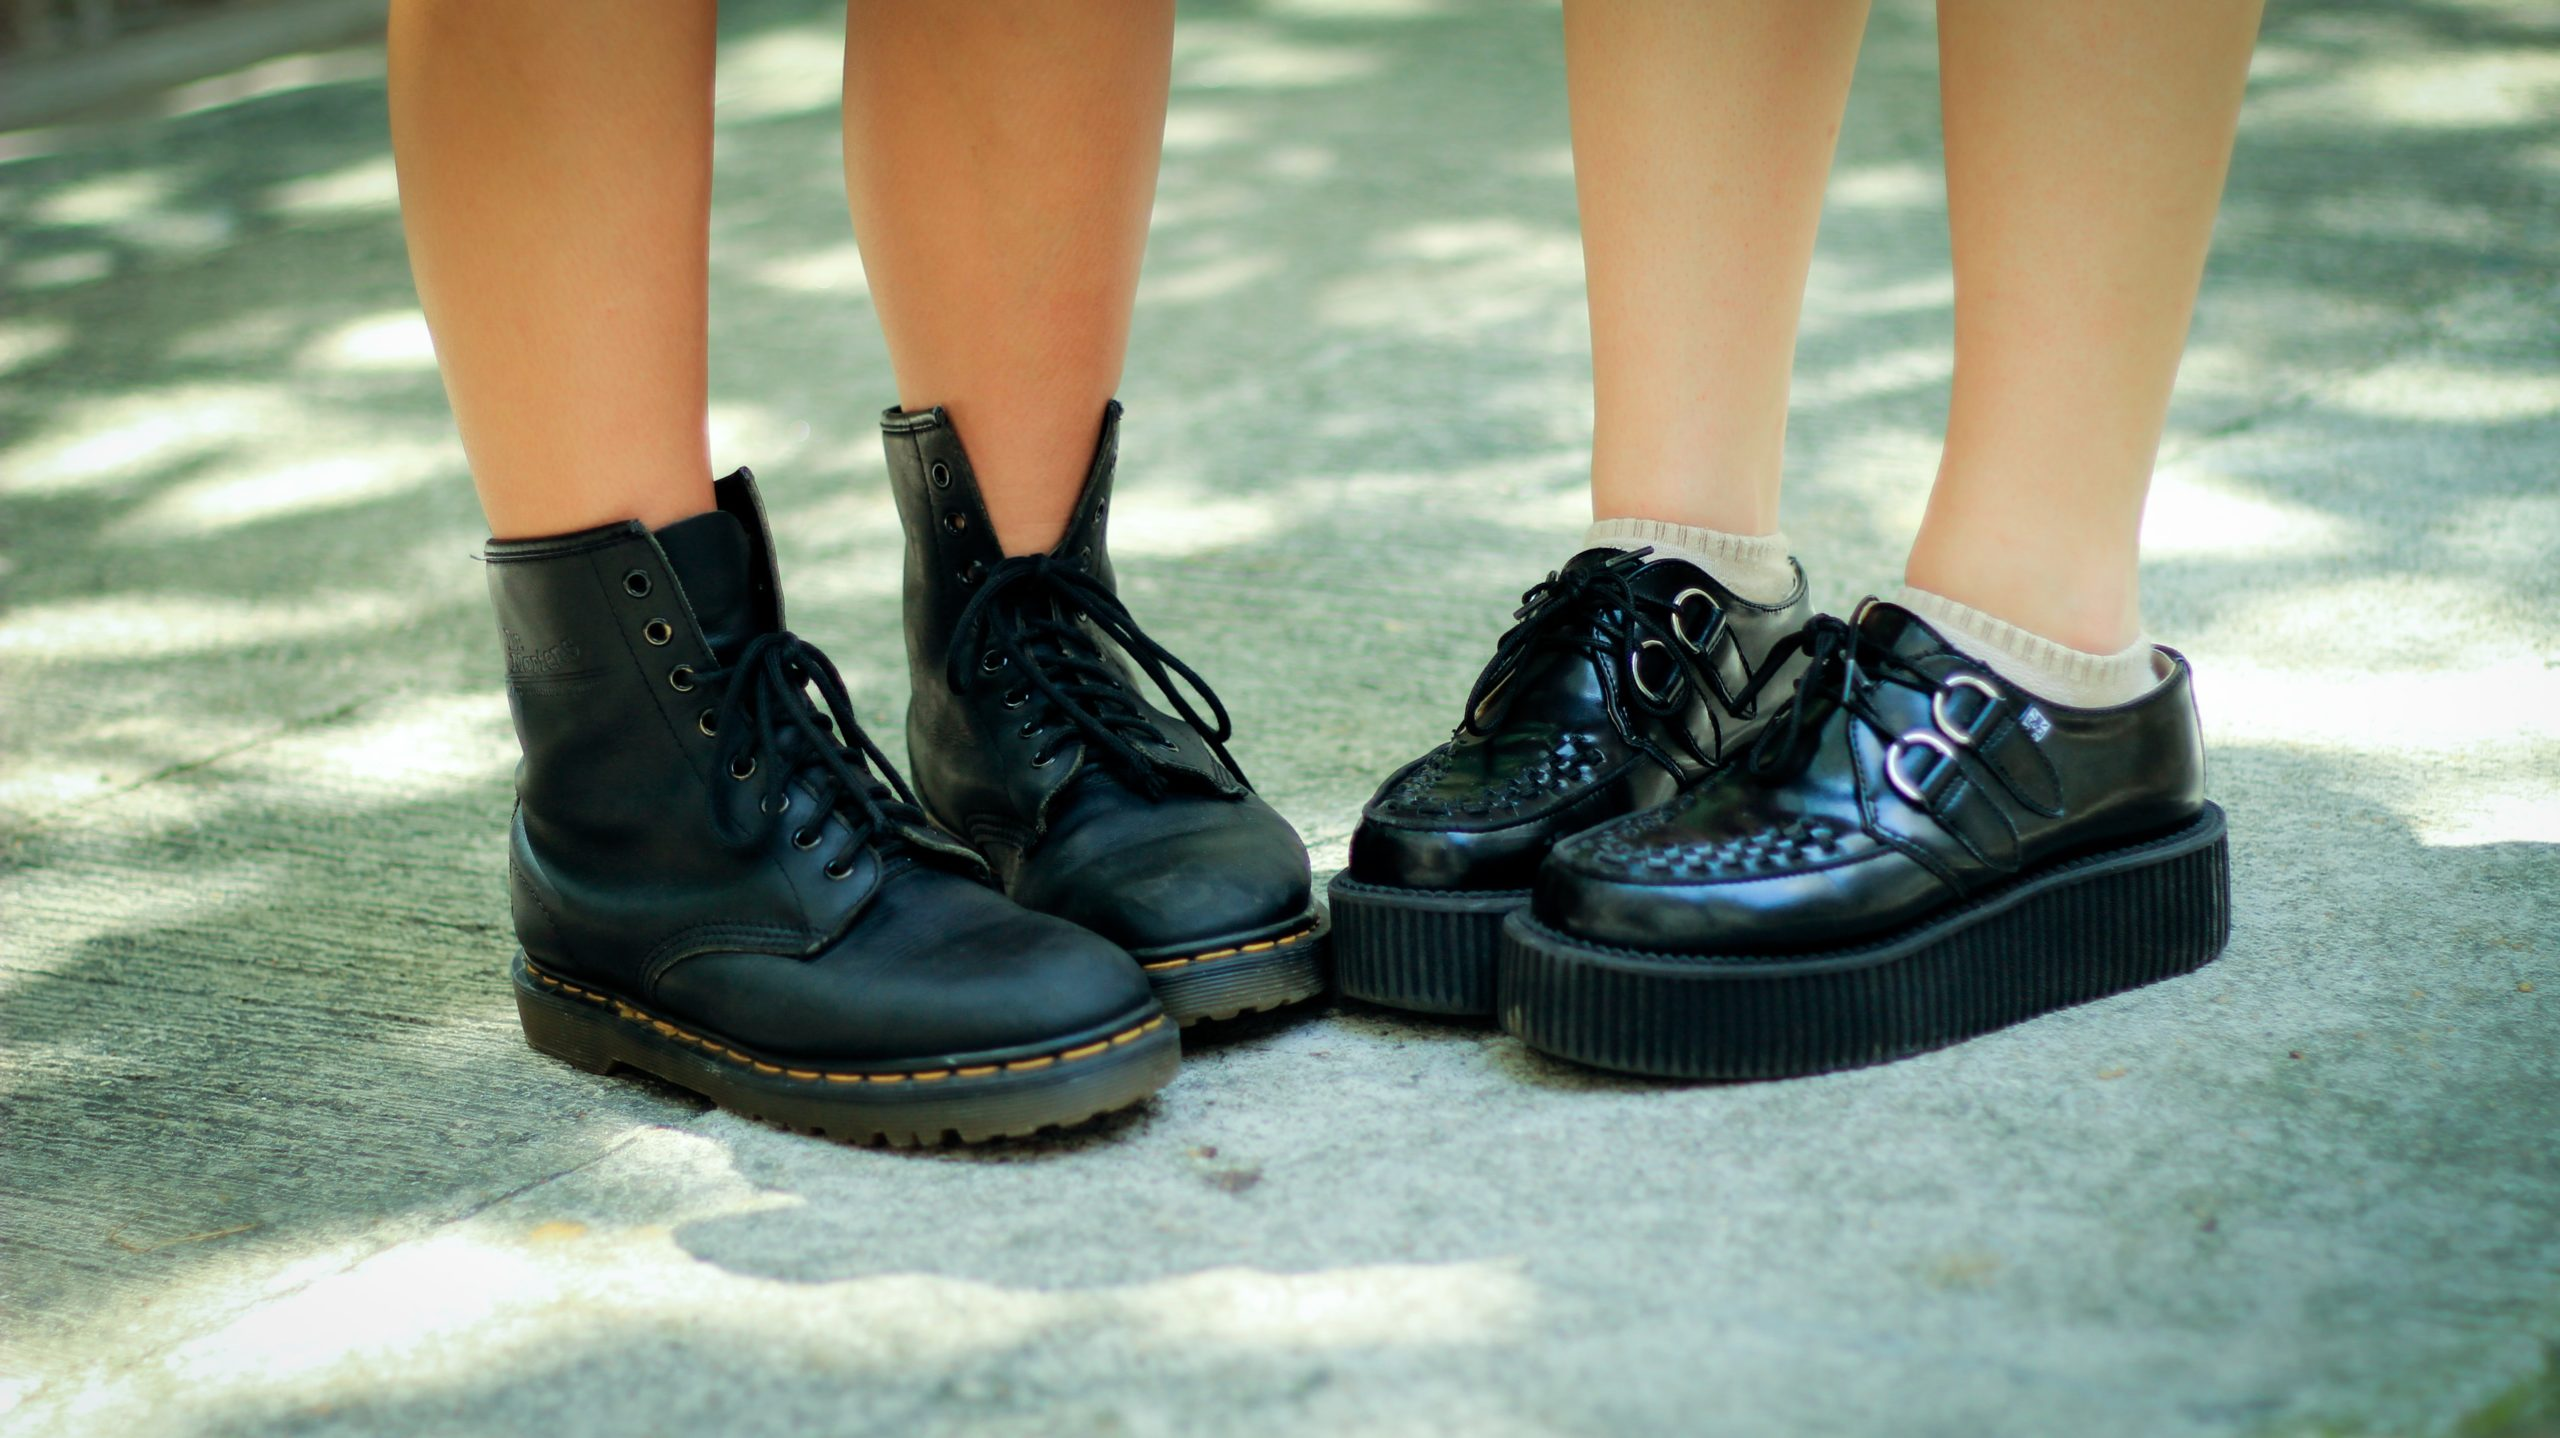 14 Best Boot Brands for Any Activity (Men + Women)